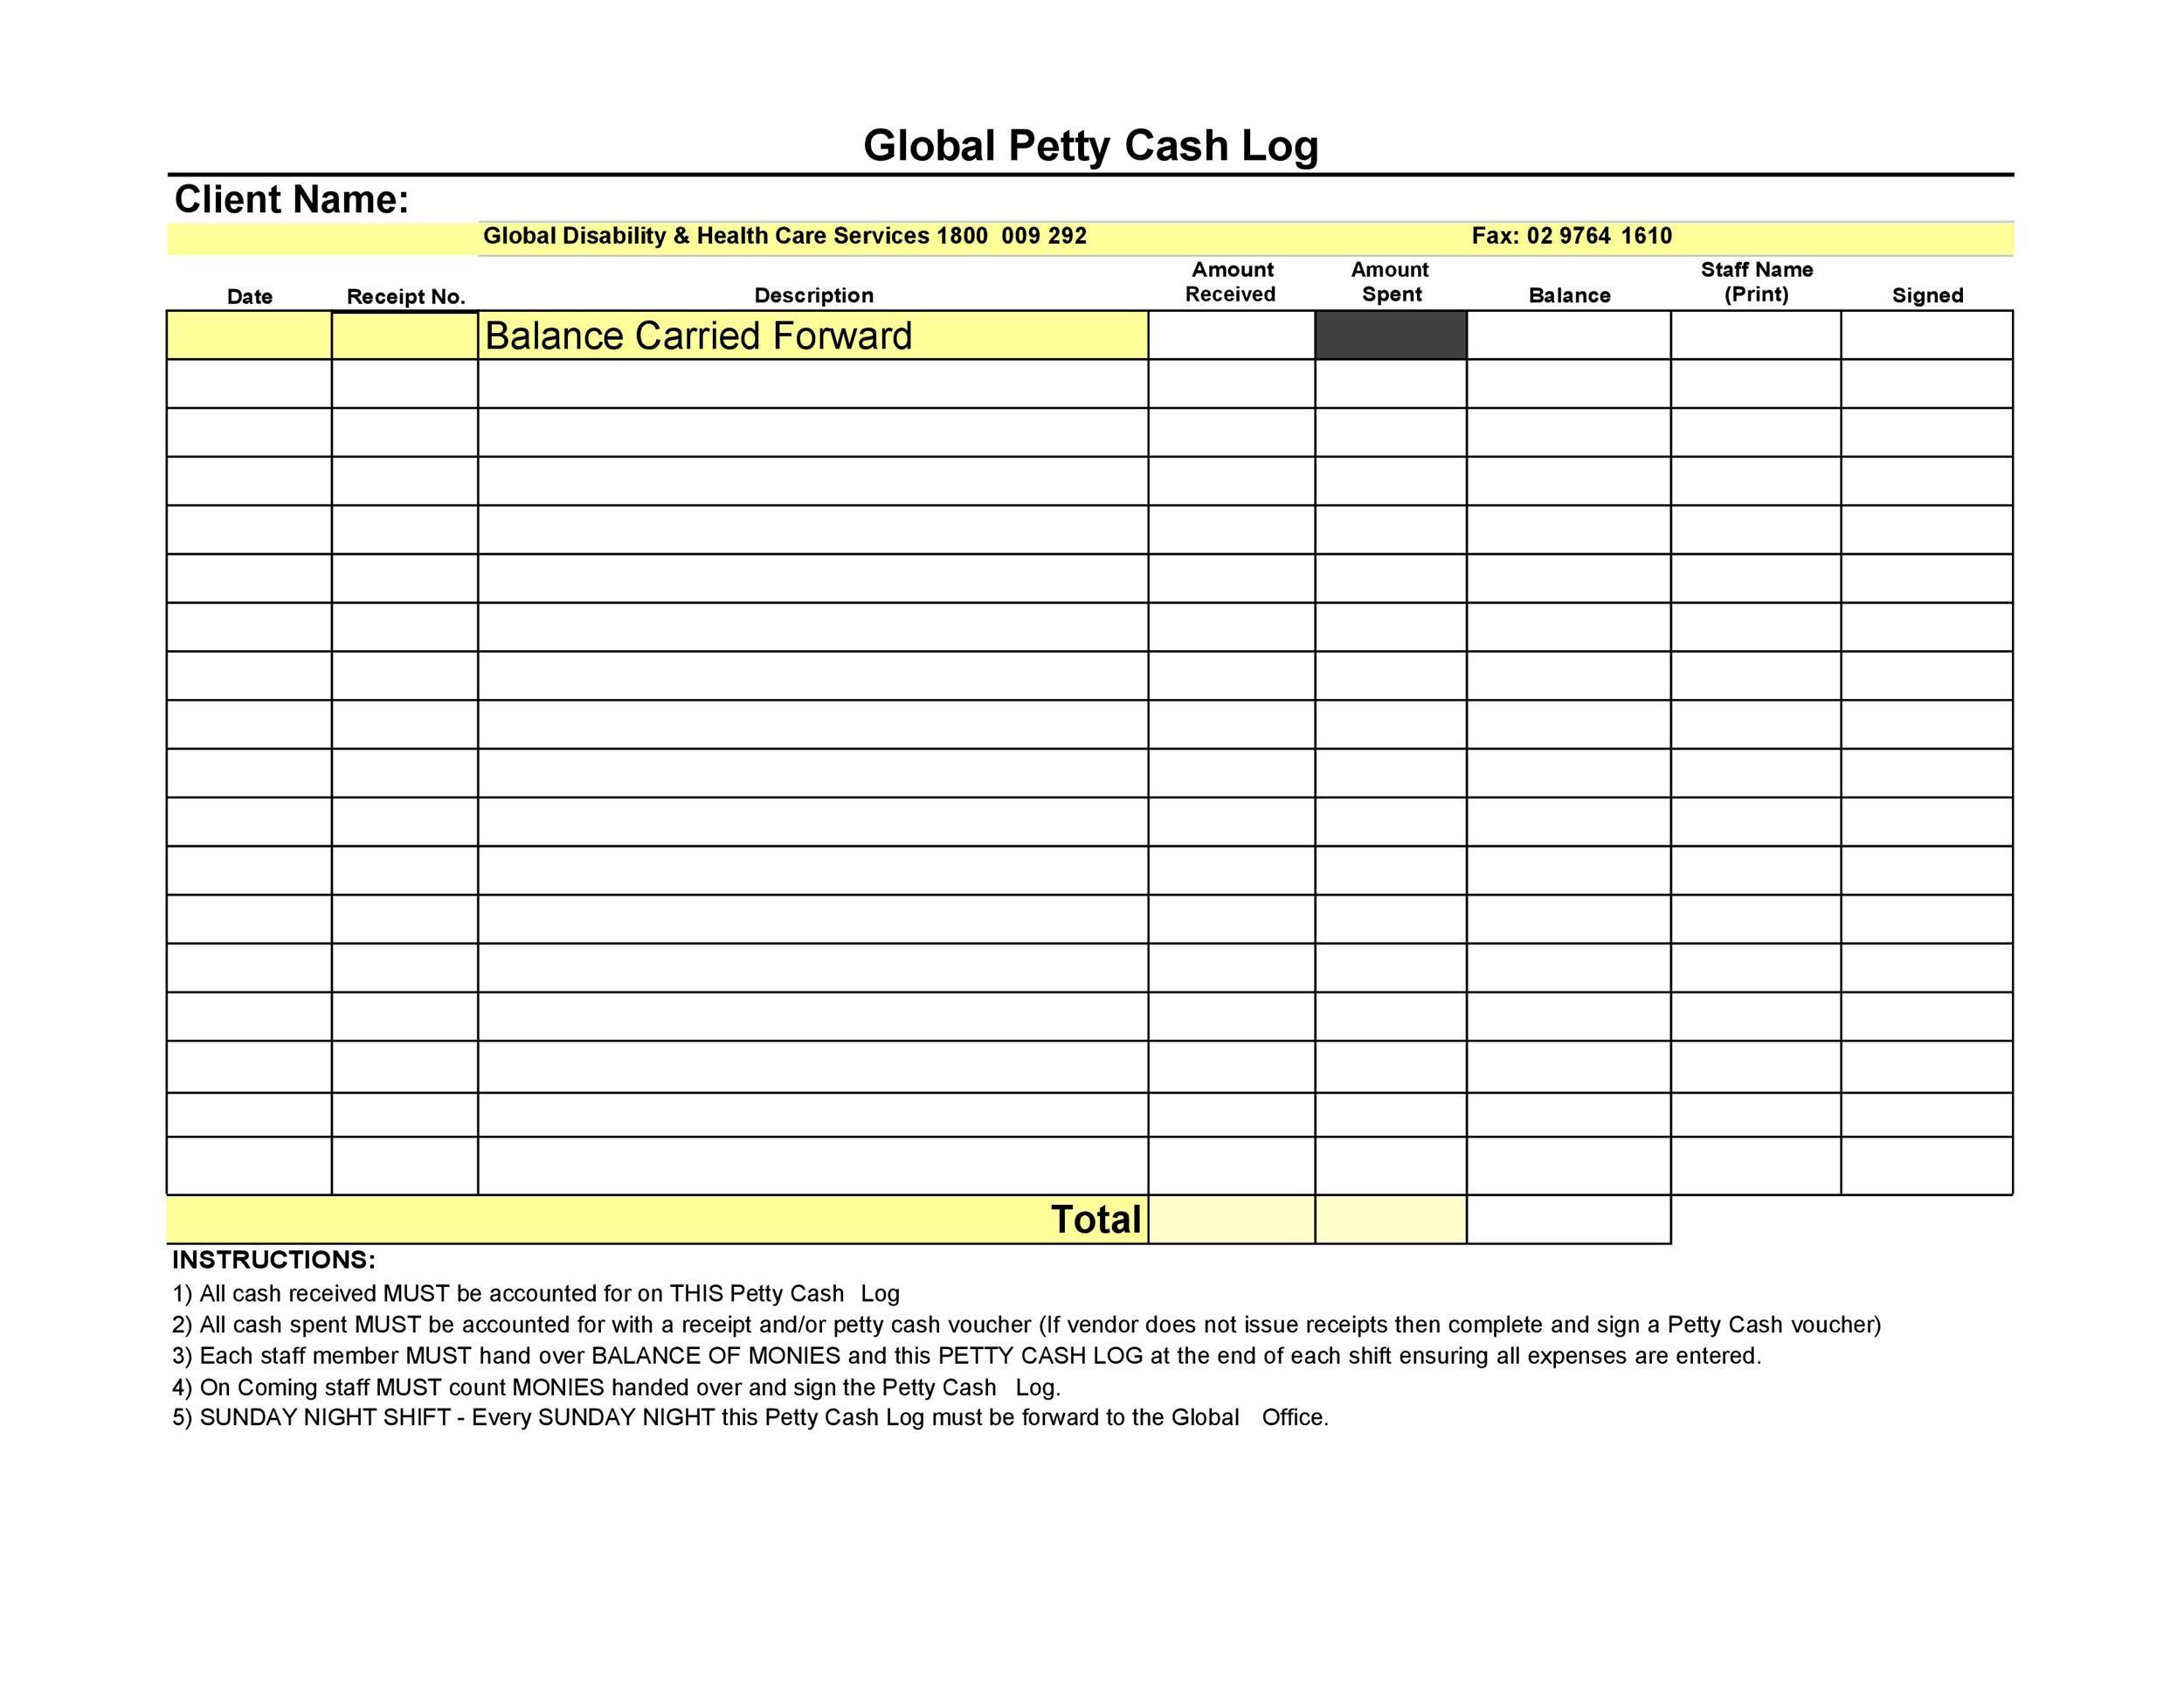 40 Petty Cash Log Templates & Forms [Excel, PDF, Word] ᐅ ...